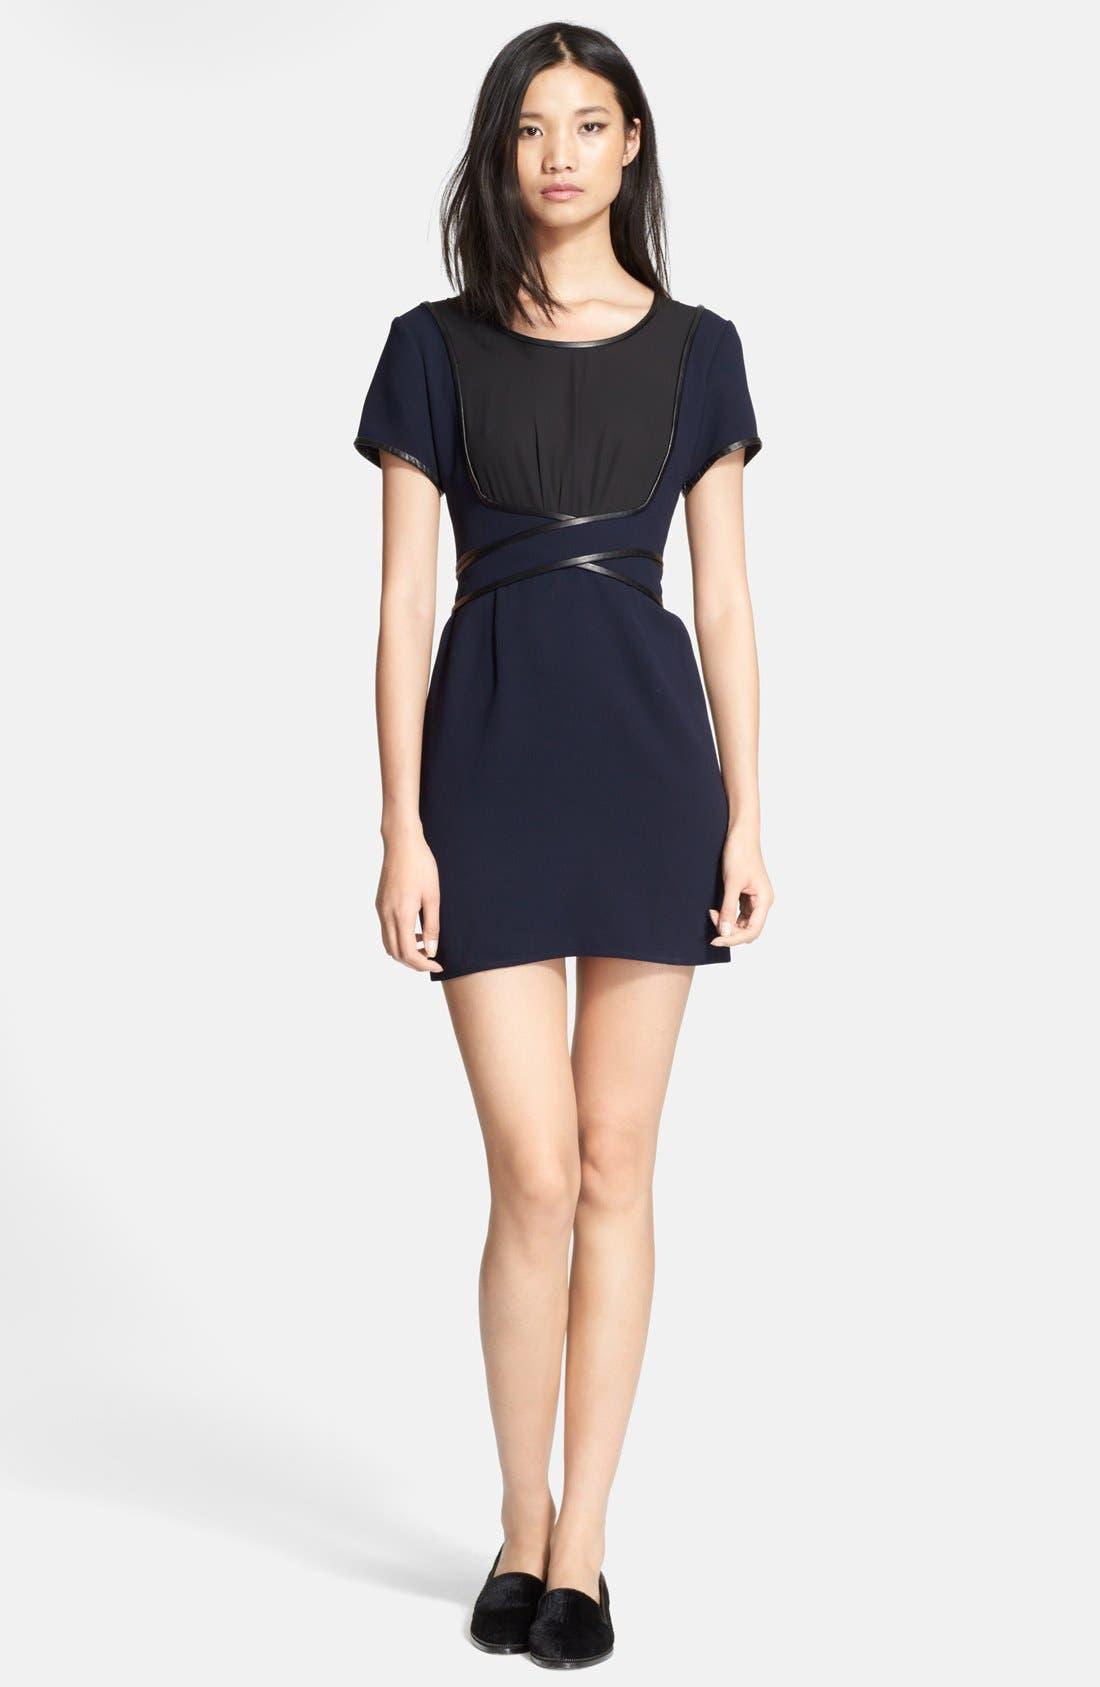 Main Image - The Kooples Leather Trim Two-Tone Crepe Dress